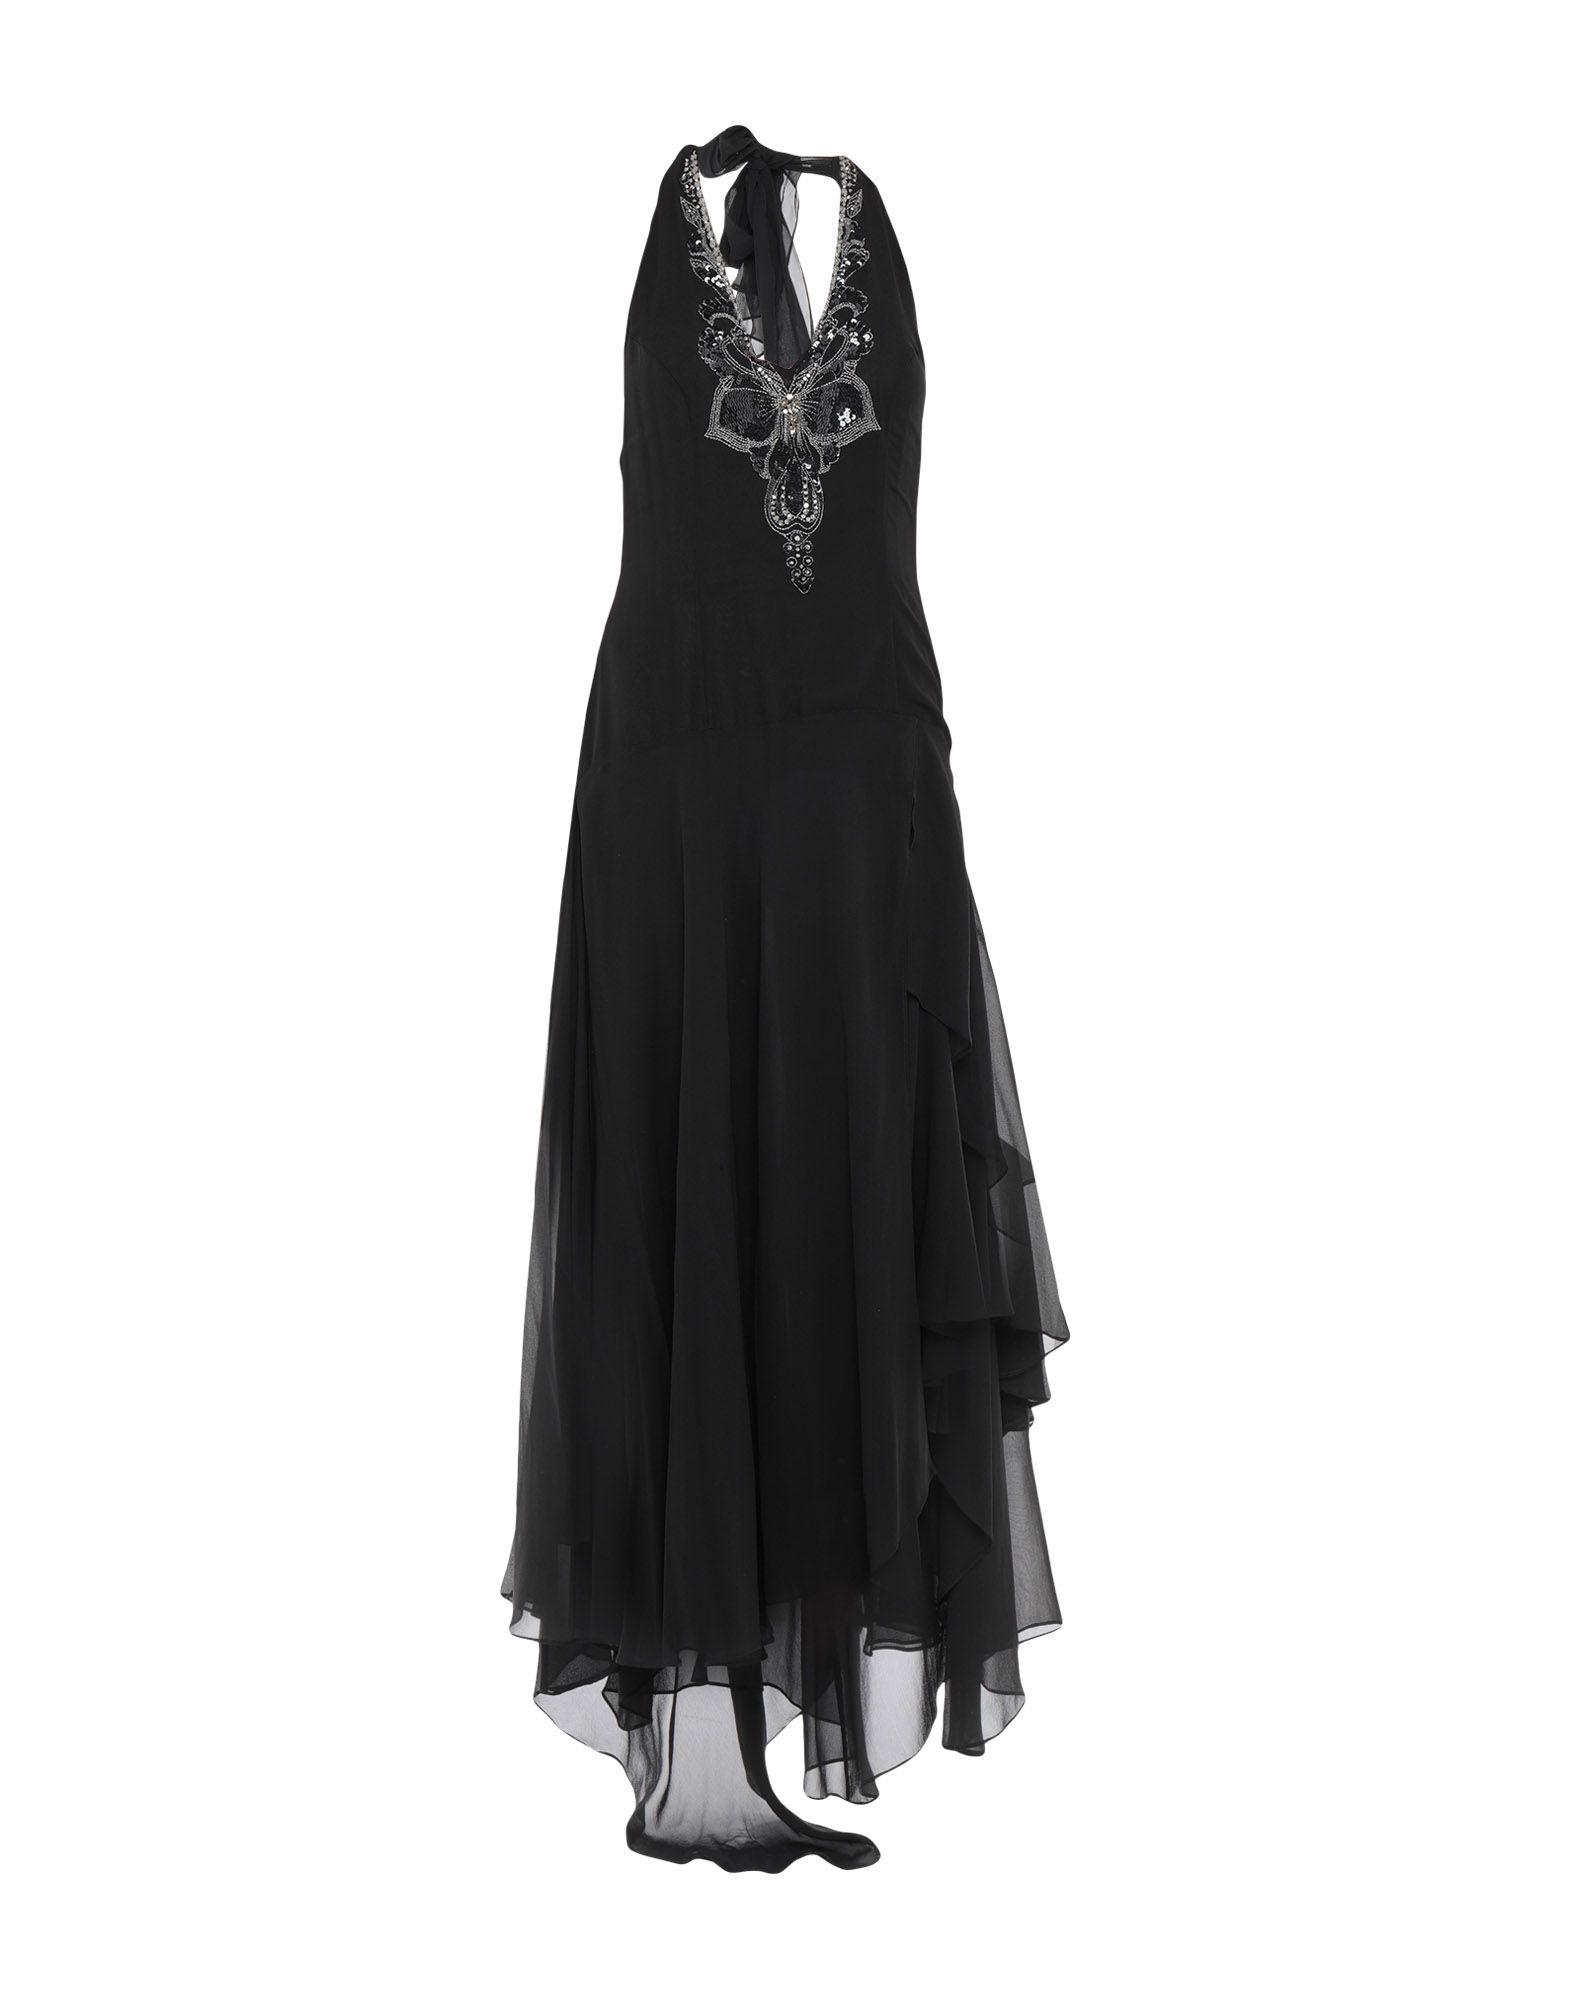 Фото - GAI MATTIOLO COUTURE Длинное платье gai mattiolo couture костюм